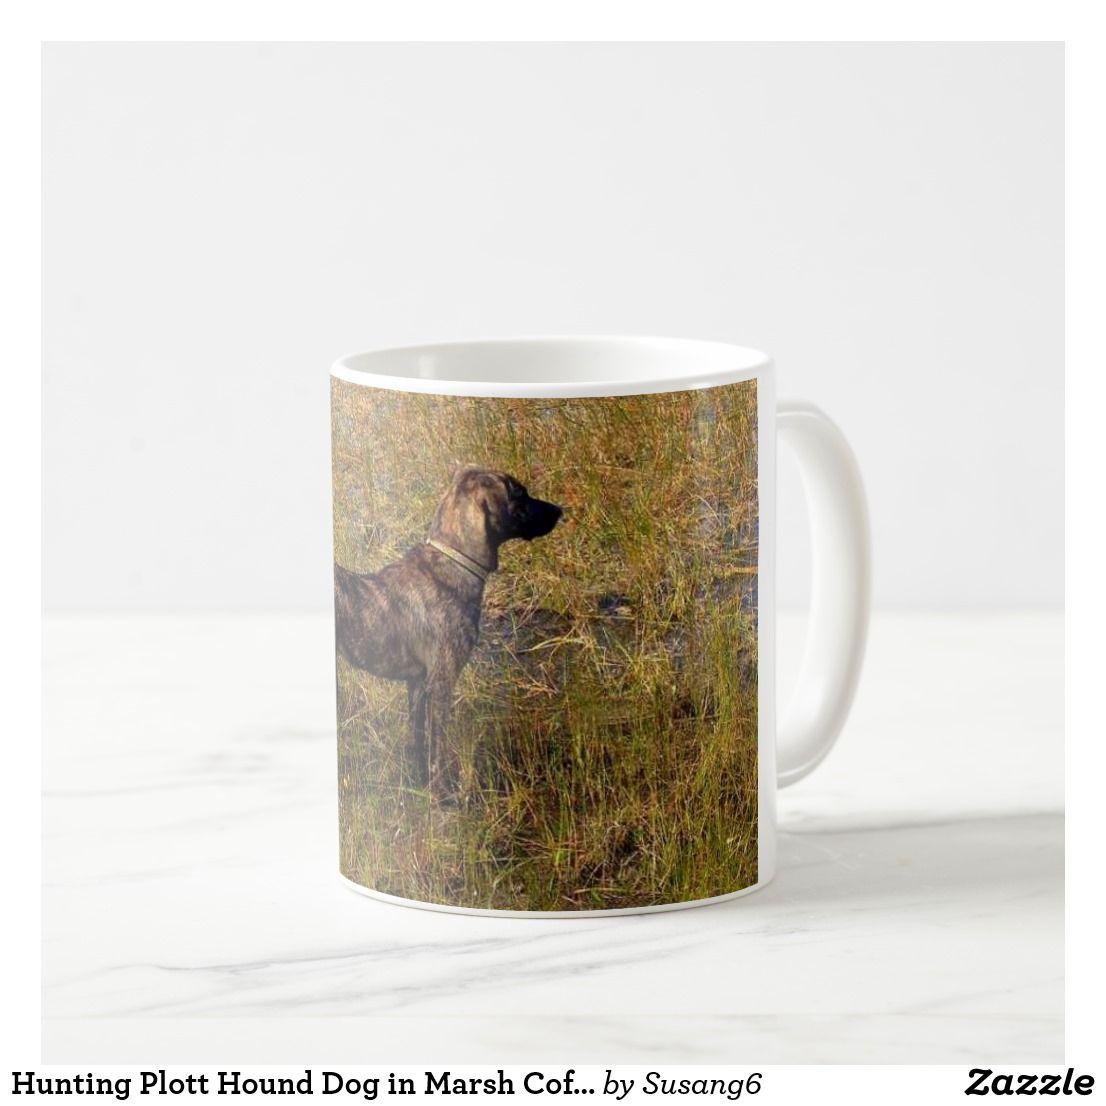 Hunting Plott Hound Dog in Marsh Coffee Mug | Zazzle.com #plotthound